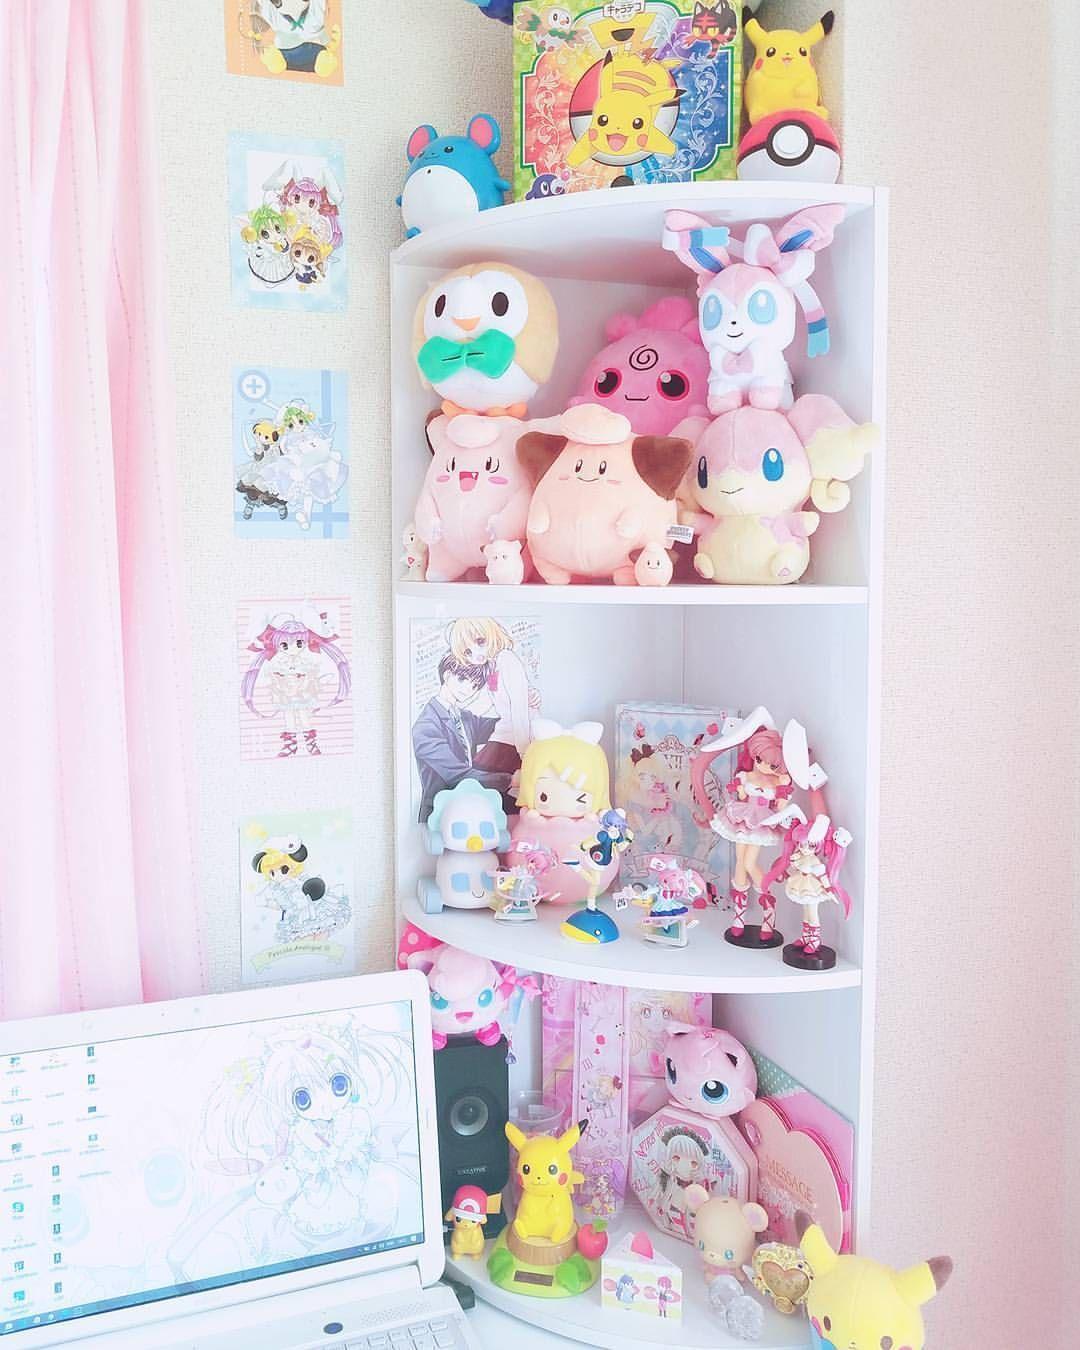 Pin By Viv Blu On Aesthetic In 2019 Otaku Room Room Decor Kawaii Bedroom Otaku Room Cute Room Ideas